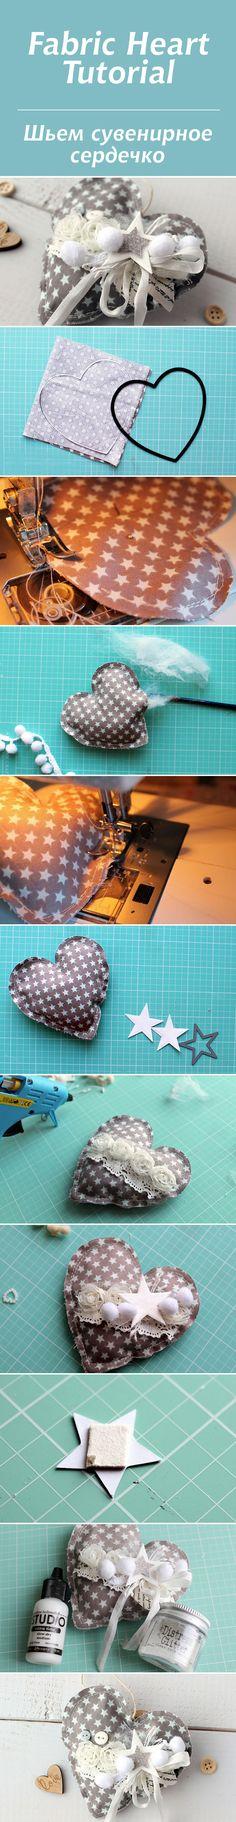 Шьем декоративное тканевое сердечко #diy #heart #stvalentine